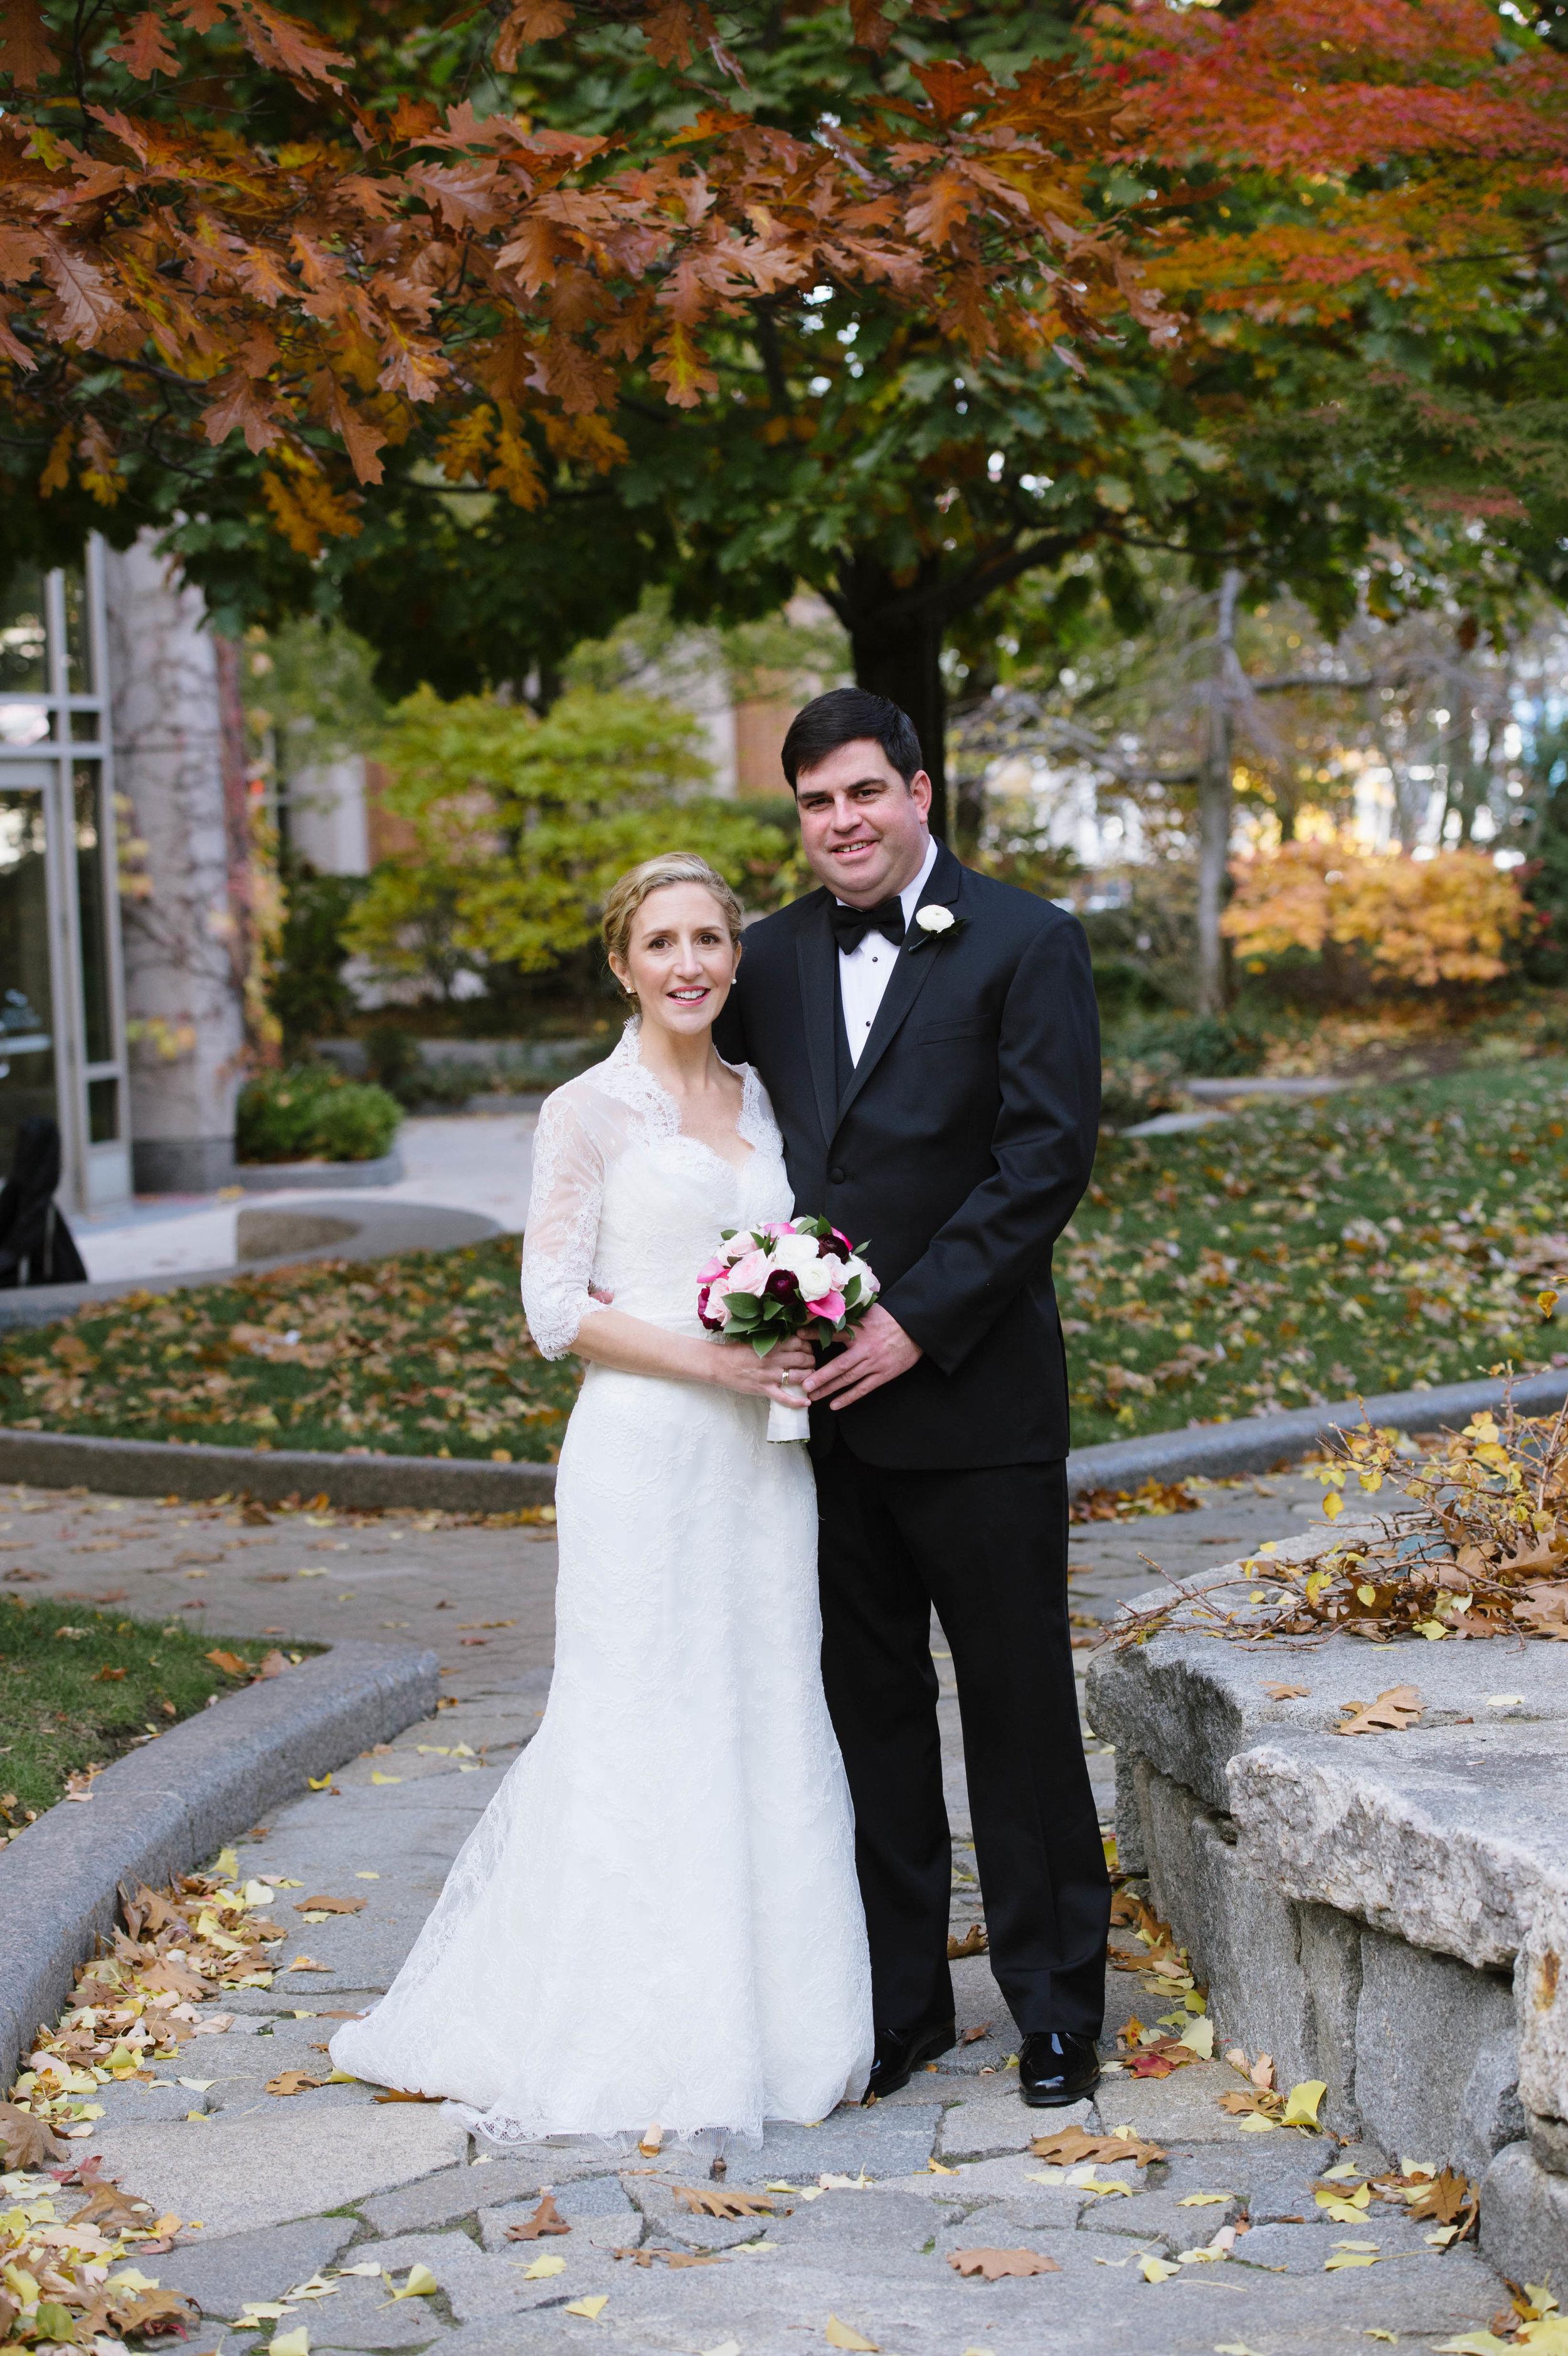 Emotional-Wedding-Photography-Boston10.jpg